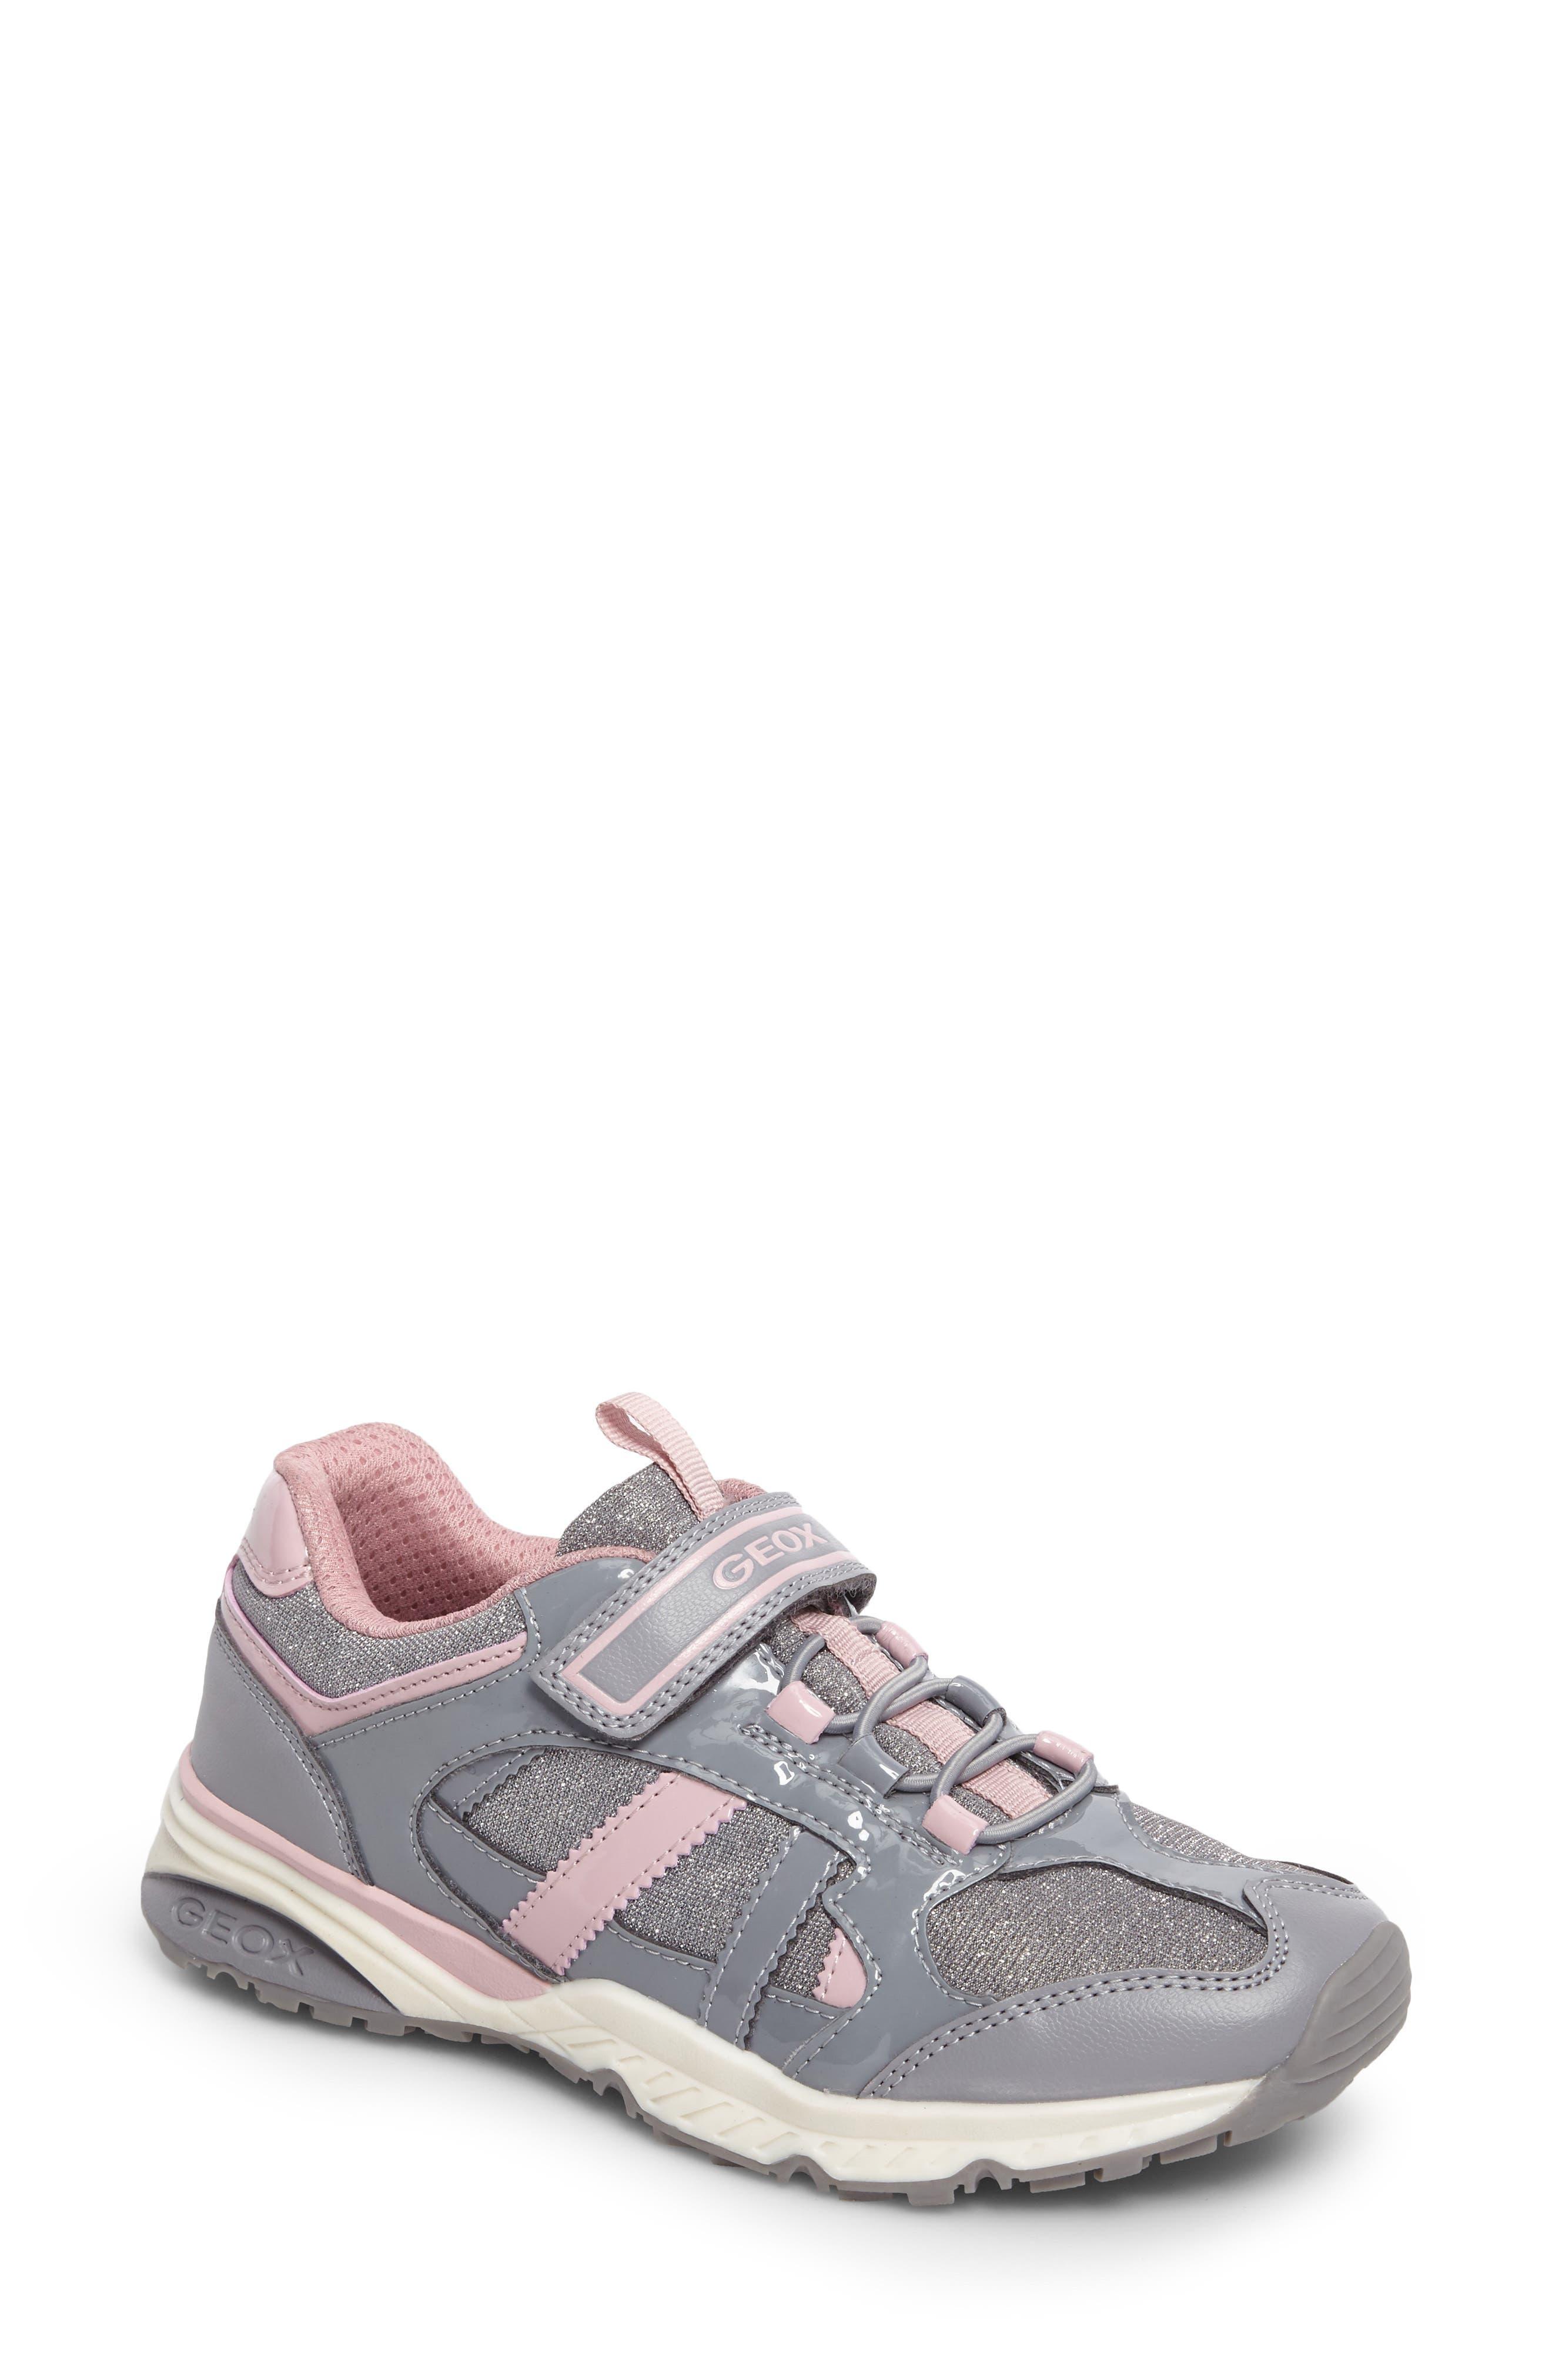 Bernie Sneaker,                             Main thumbnail 1, color,                             020